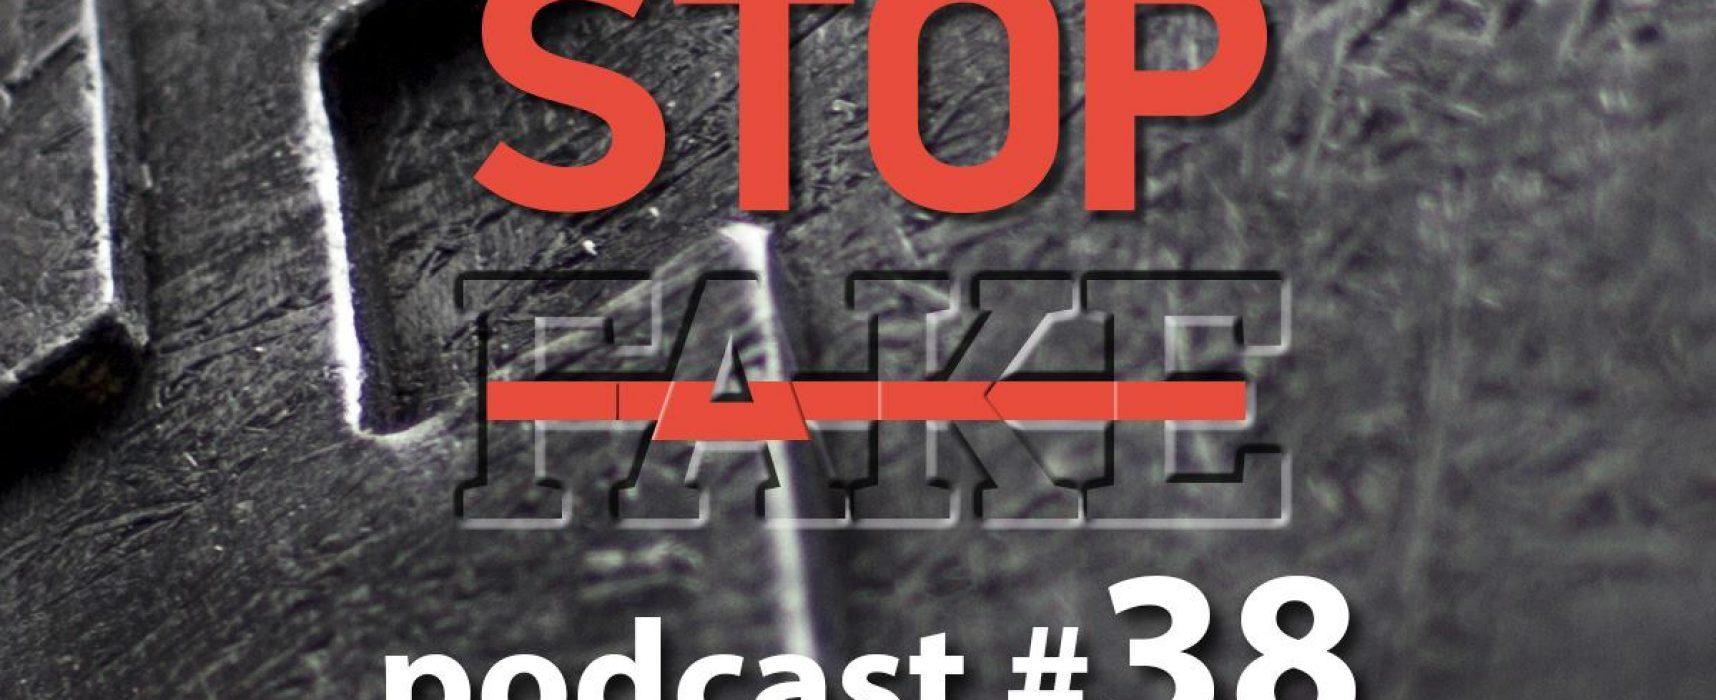 StopFake podcast #38